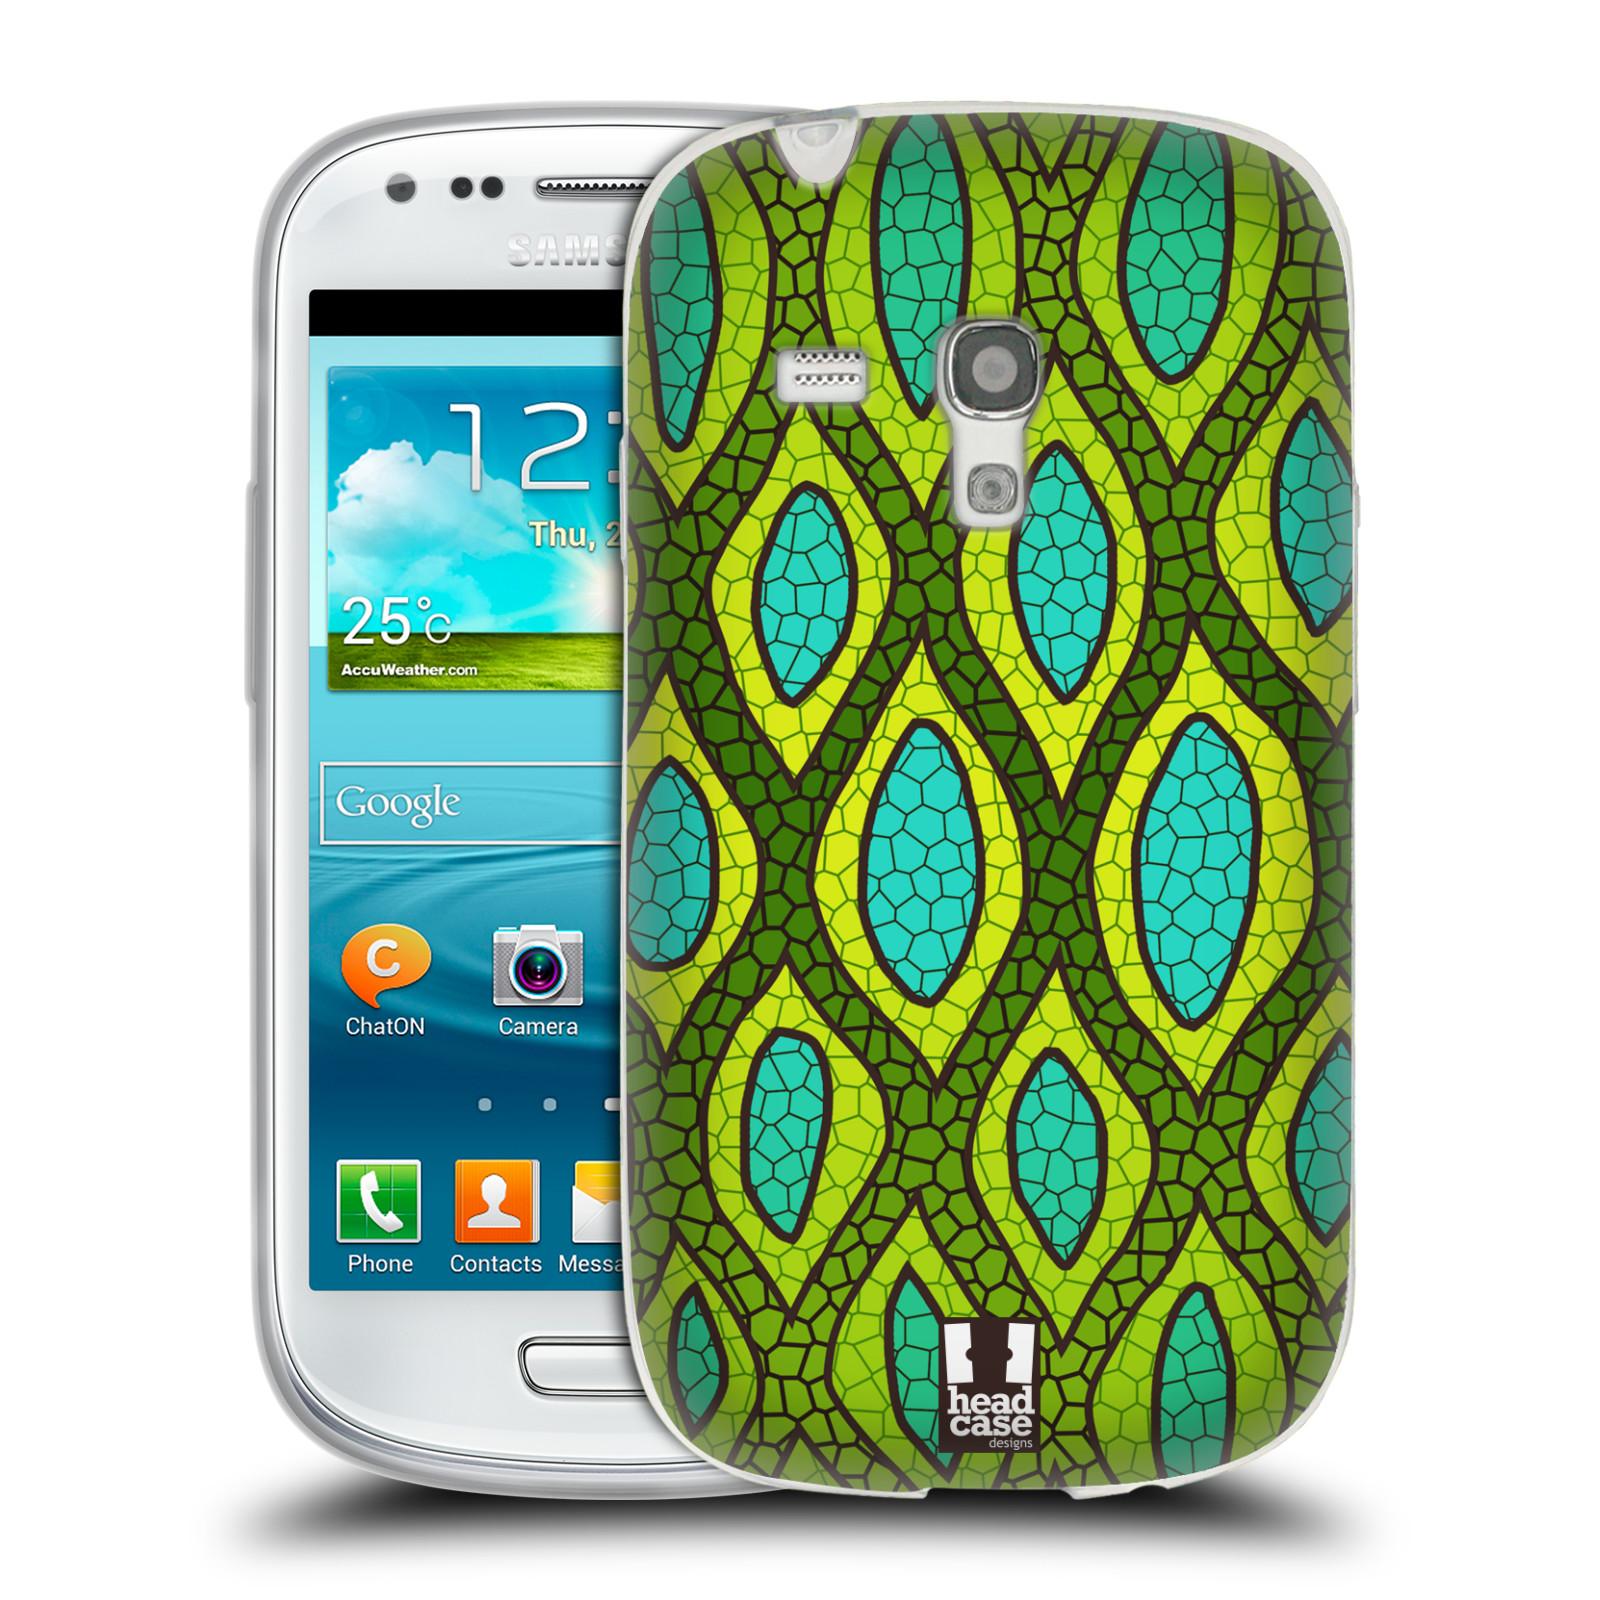 HEAD CASE silikonový obal na mobil Samsung Galaxy S3 MINI i8190 vzor Divočina zvíře 2 hadí kůže zelená